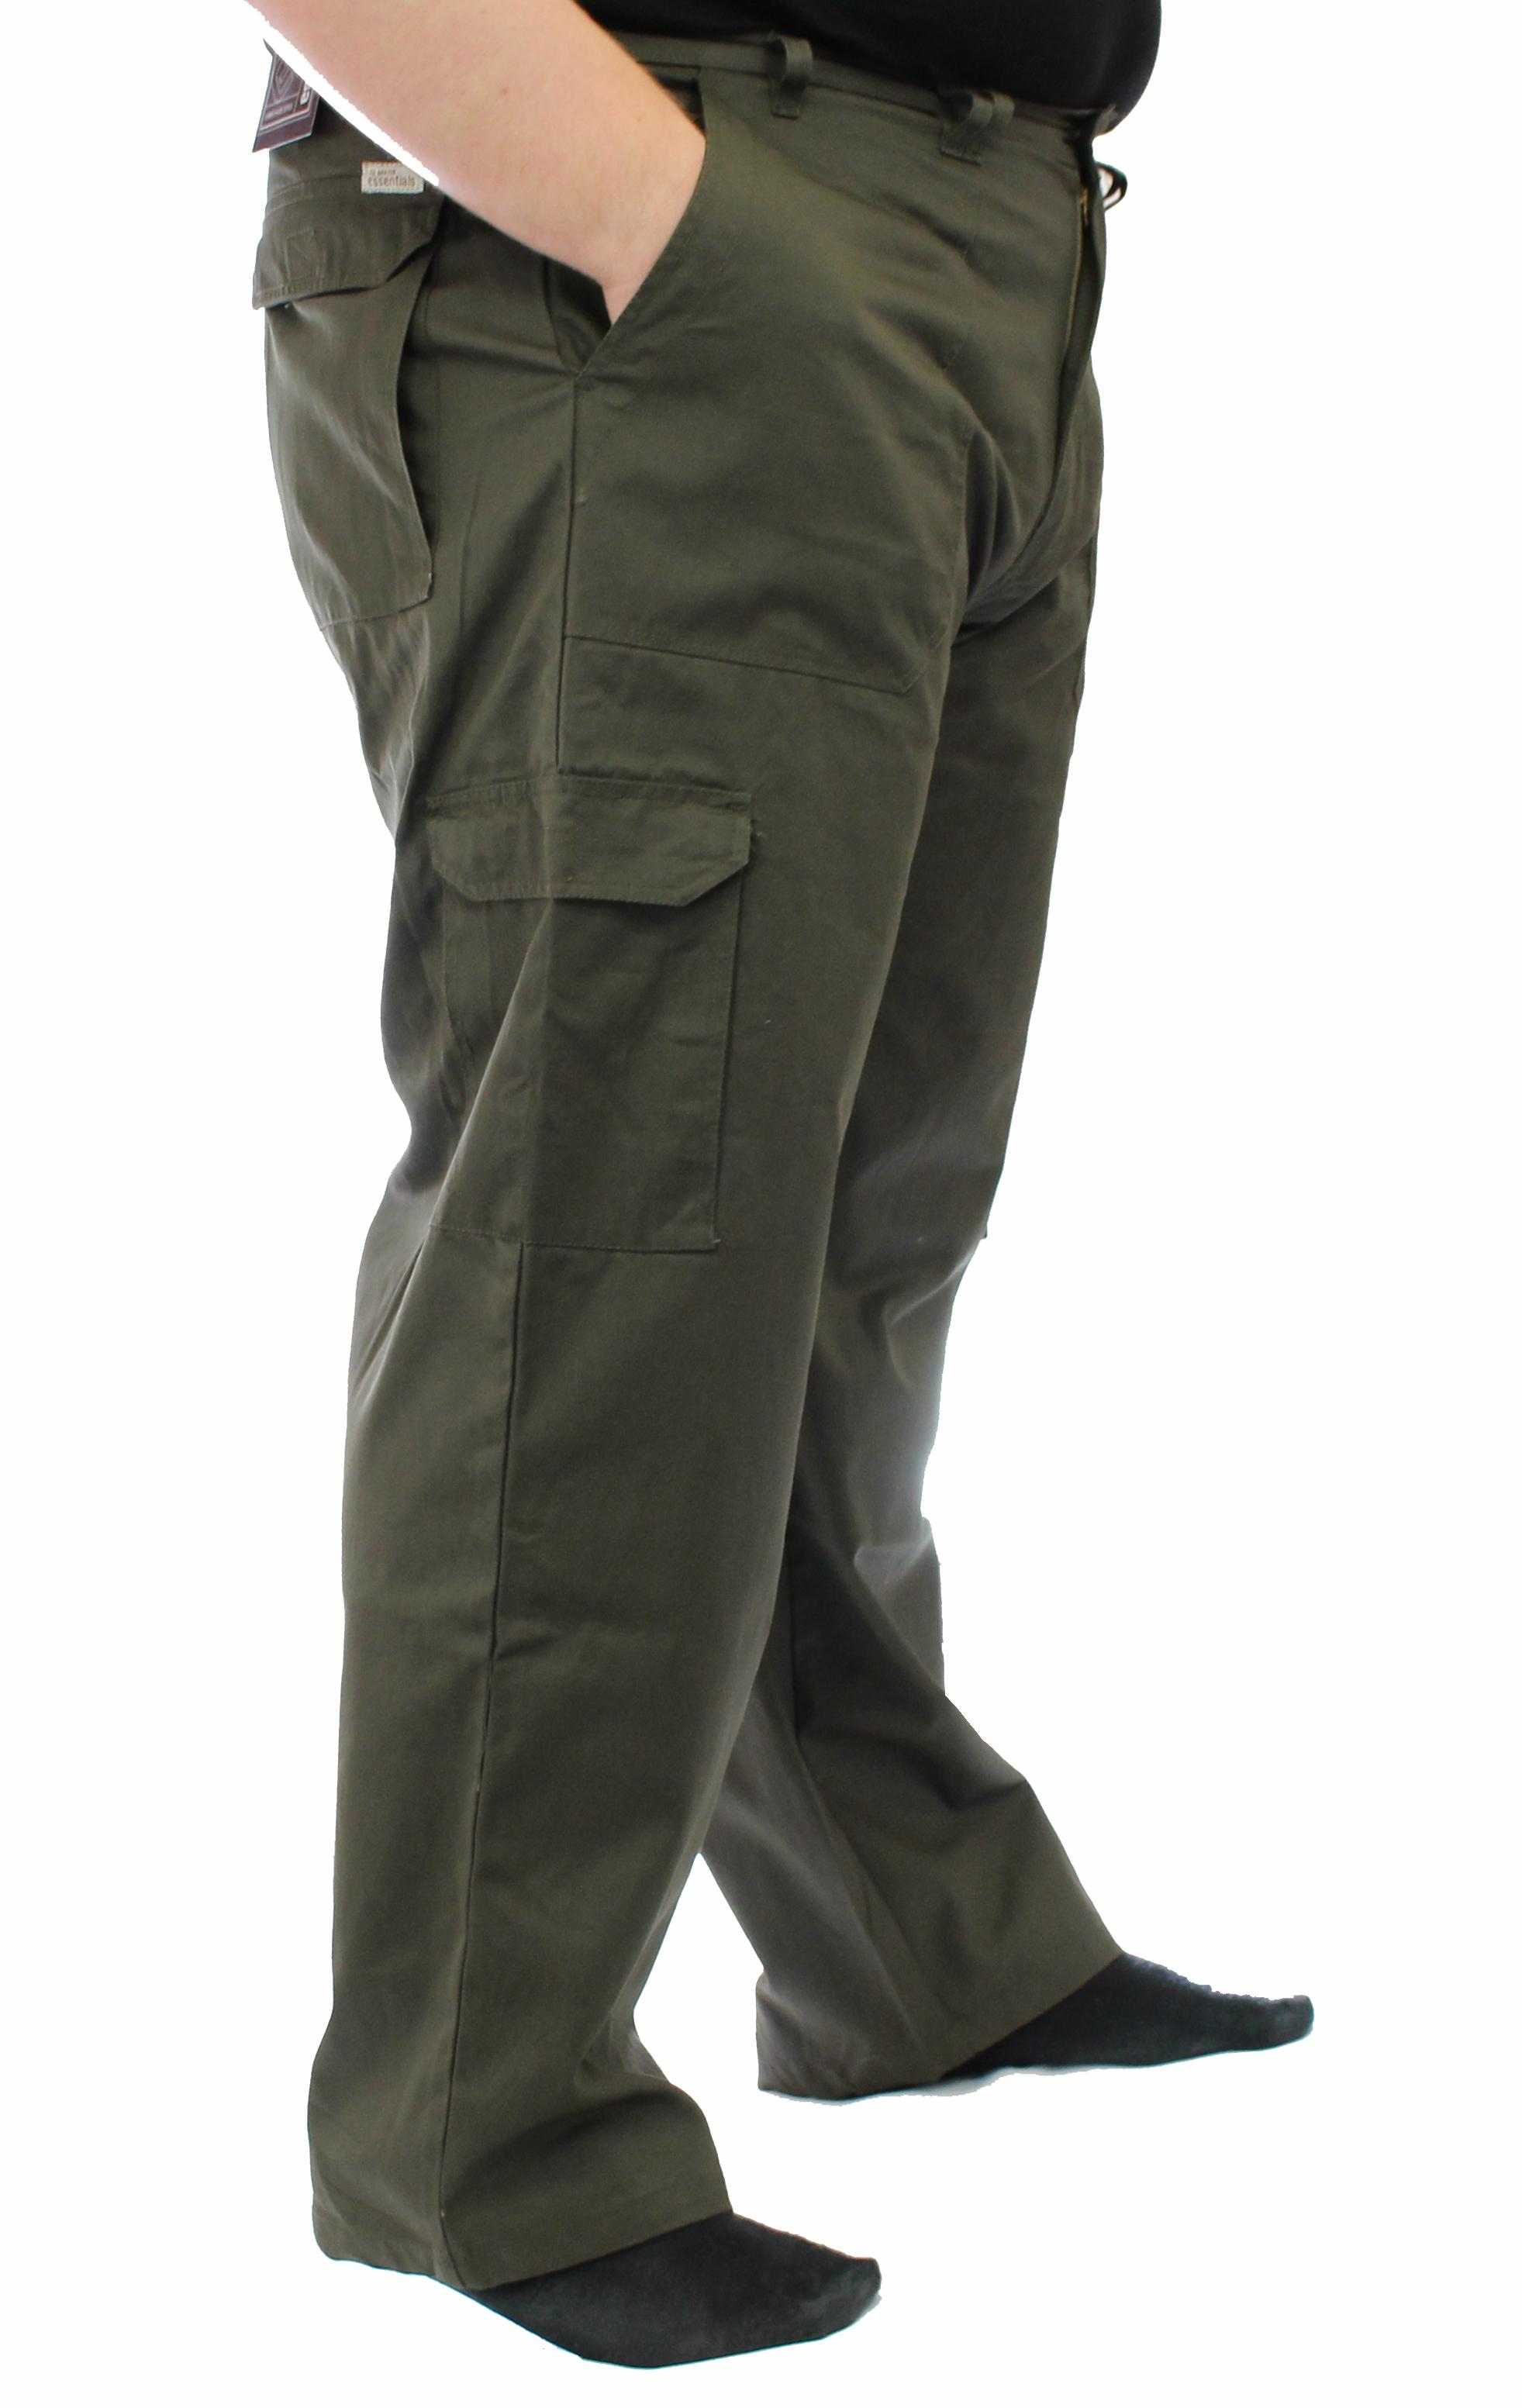 "Ed Baxter Victory - Heavy Duty Cargo Combat Trousers - Khaki - 60"" Waist, 34"" Leg"